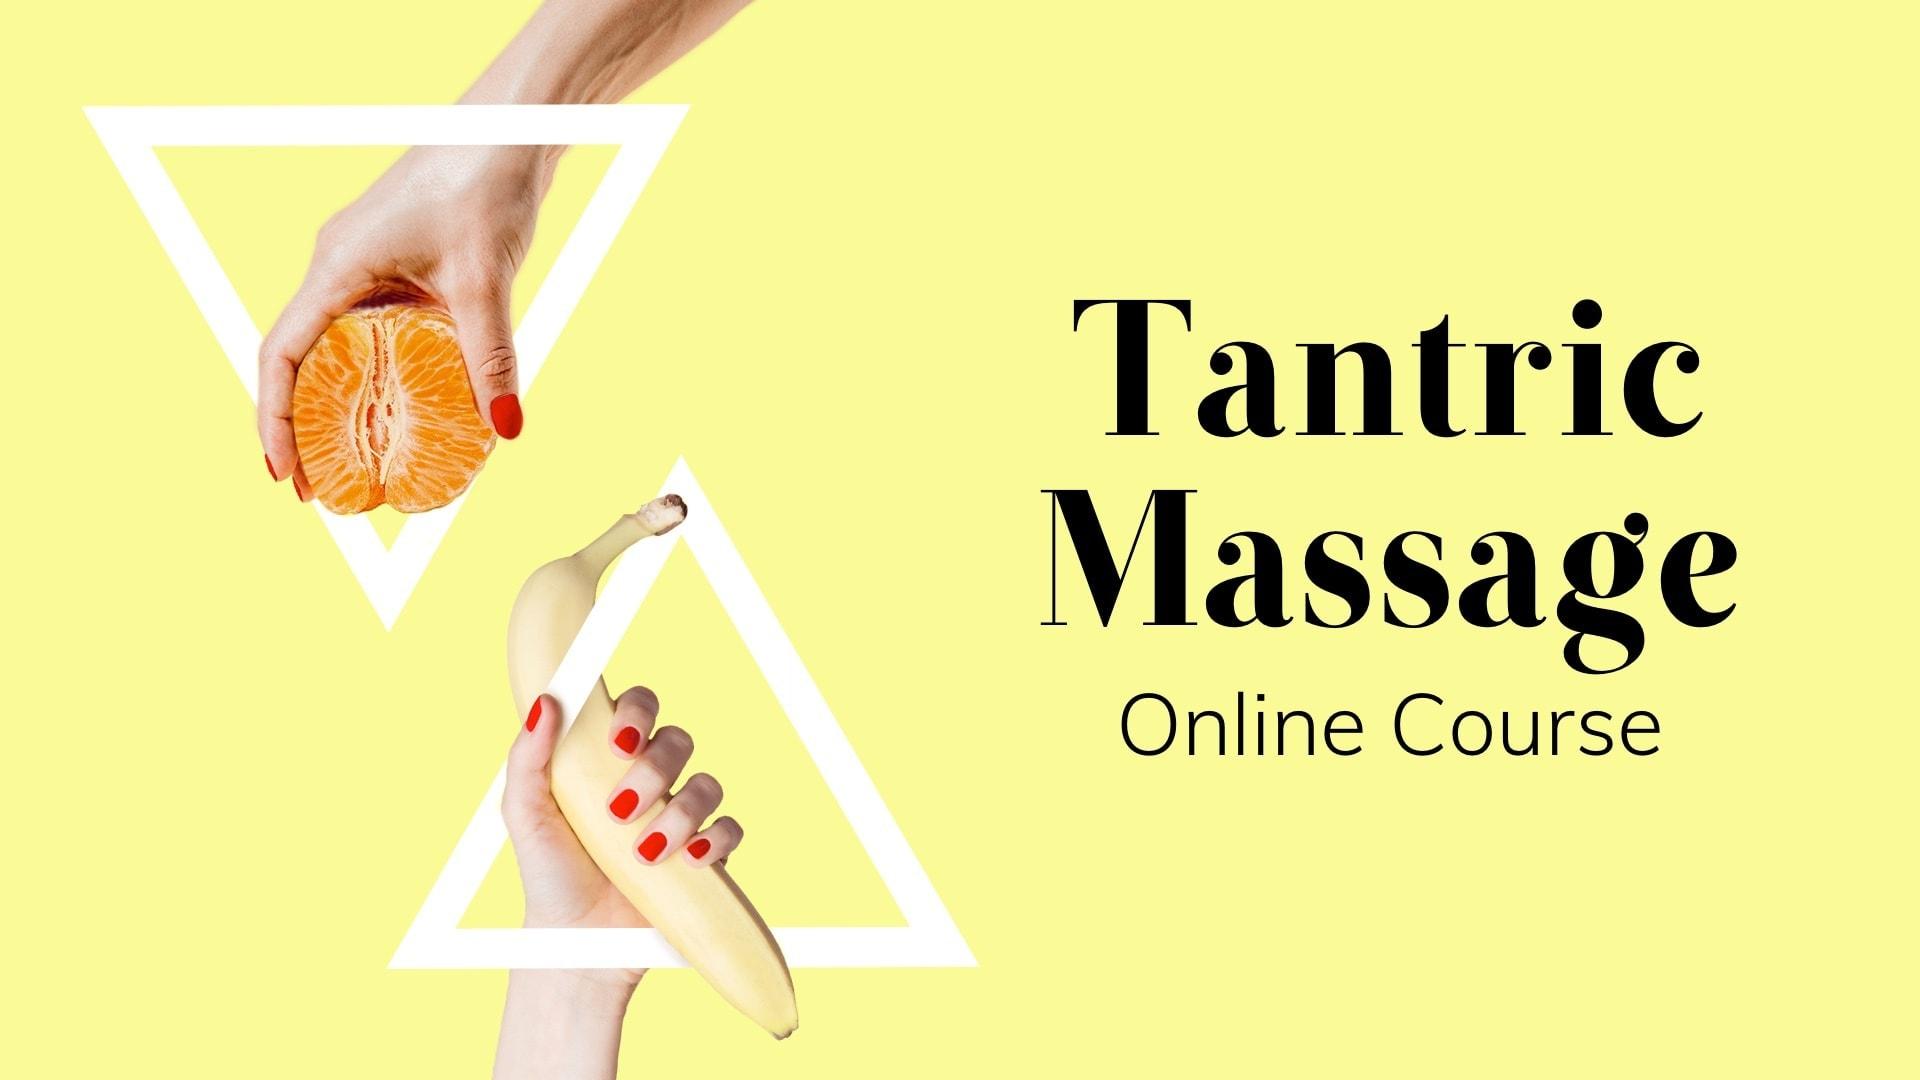 tantra massage course